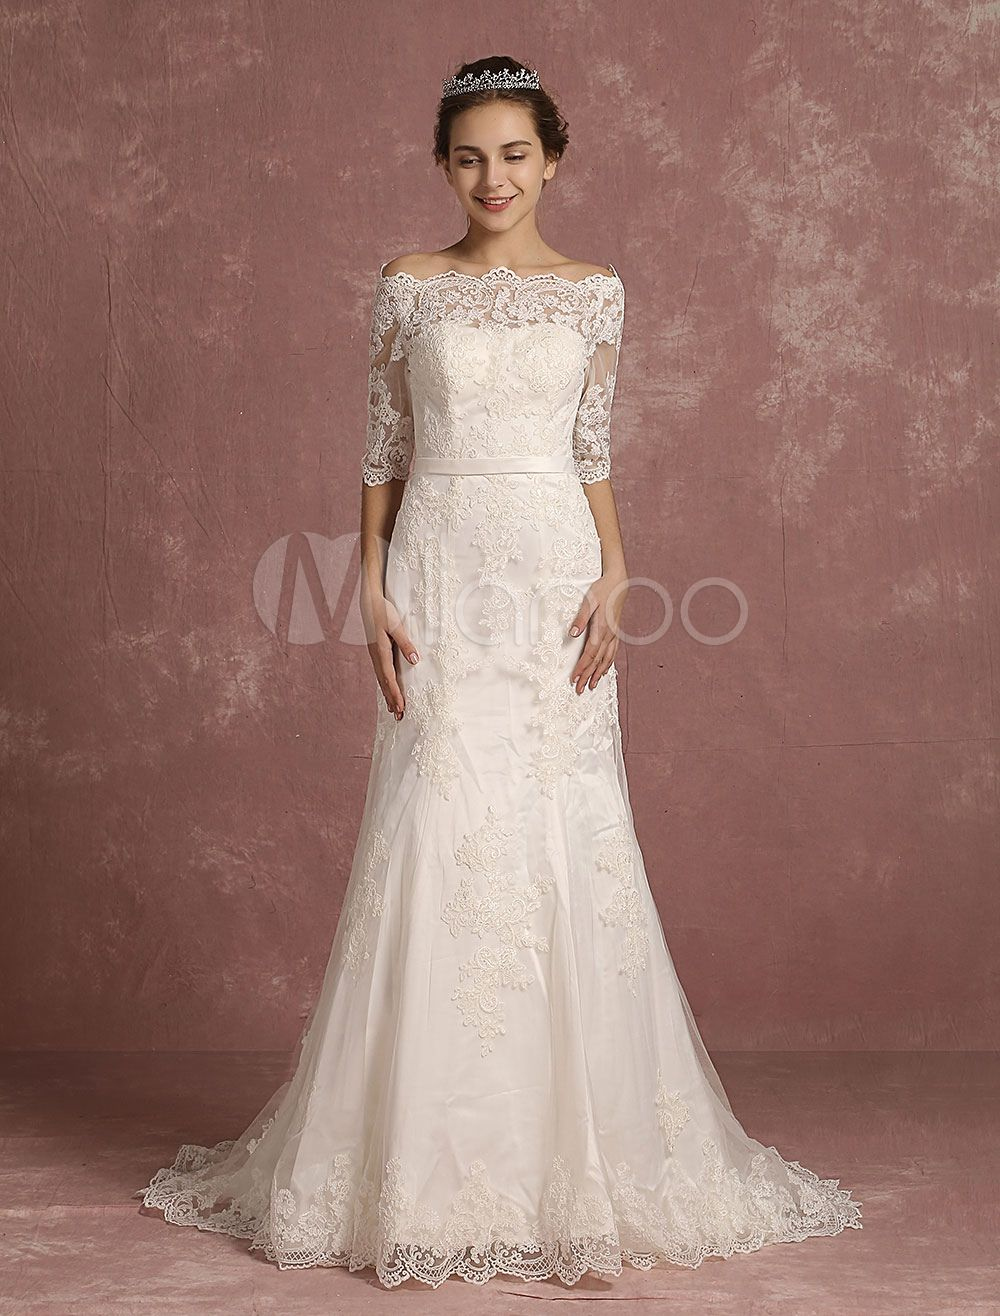 Mermaid wedding dress lace half sleeve bridal gown bateau beaded